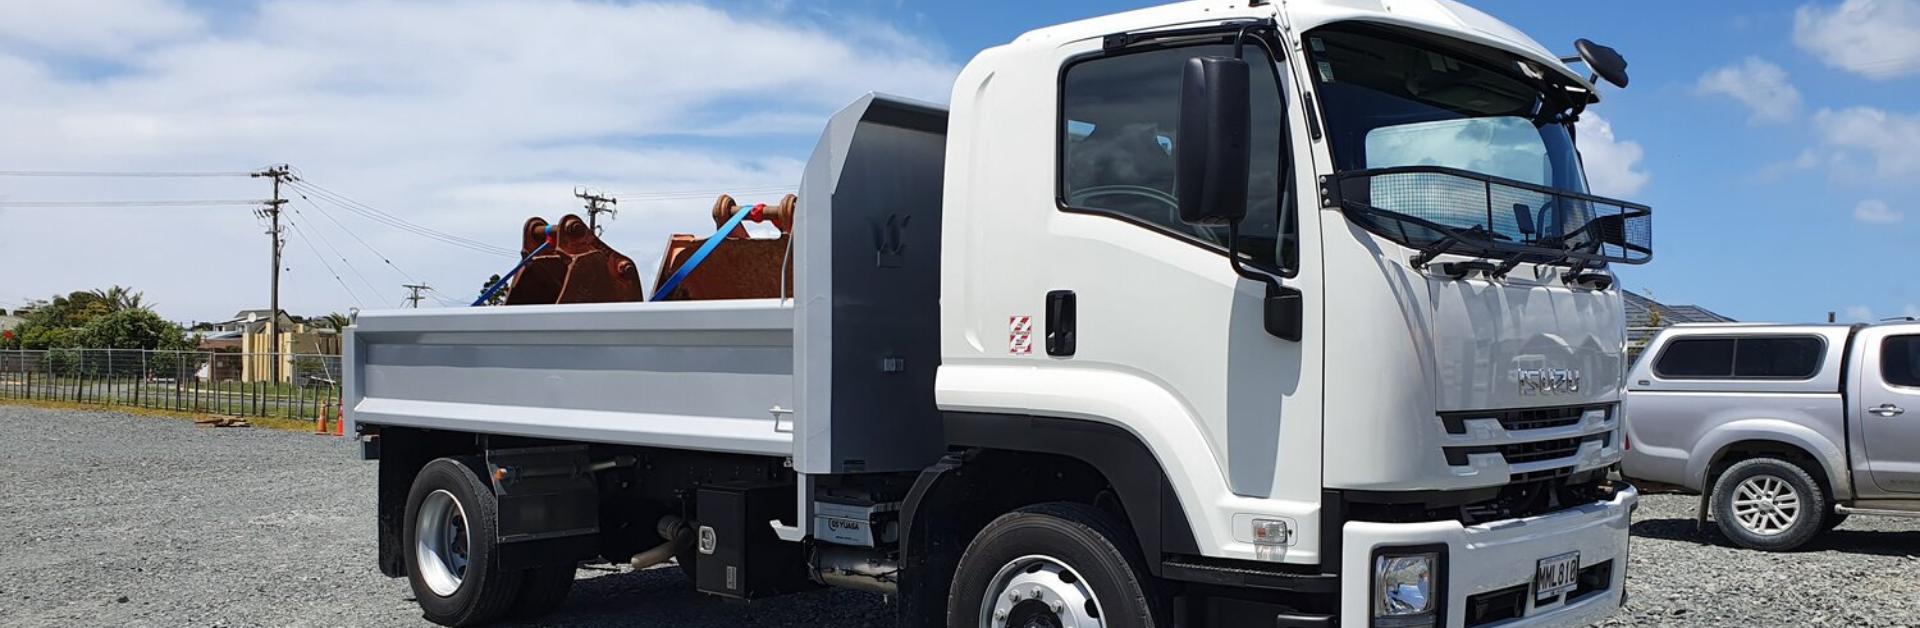 Tipper truck hire Hickey Contractors